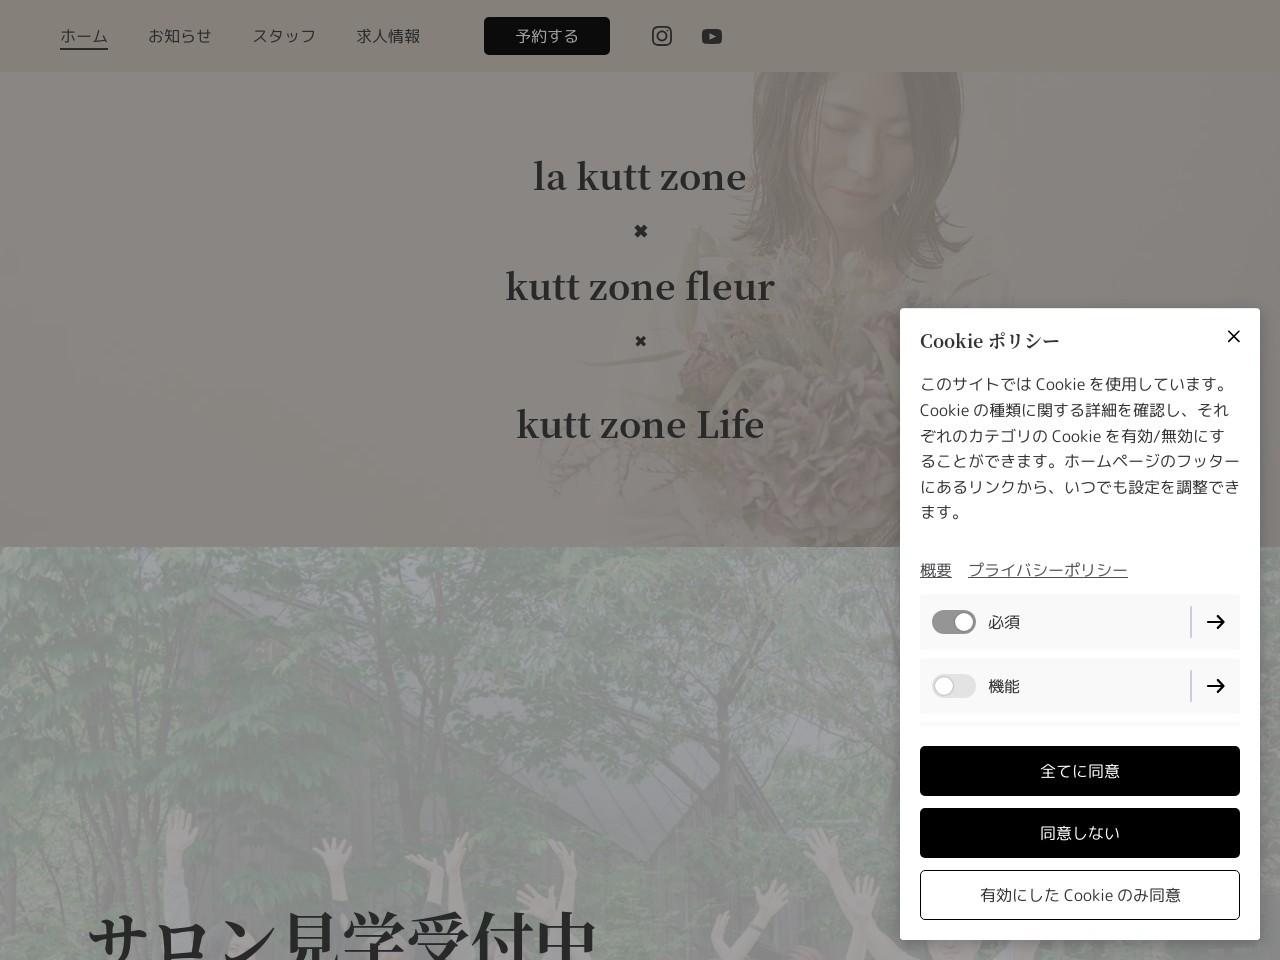 la kutt zone(ラカットゾーン)